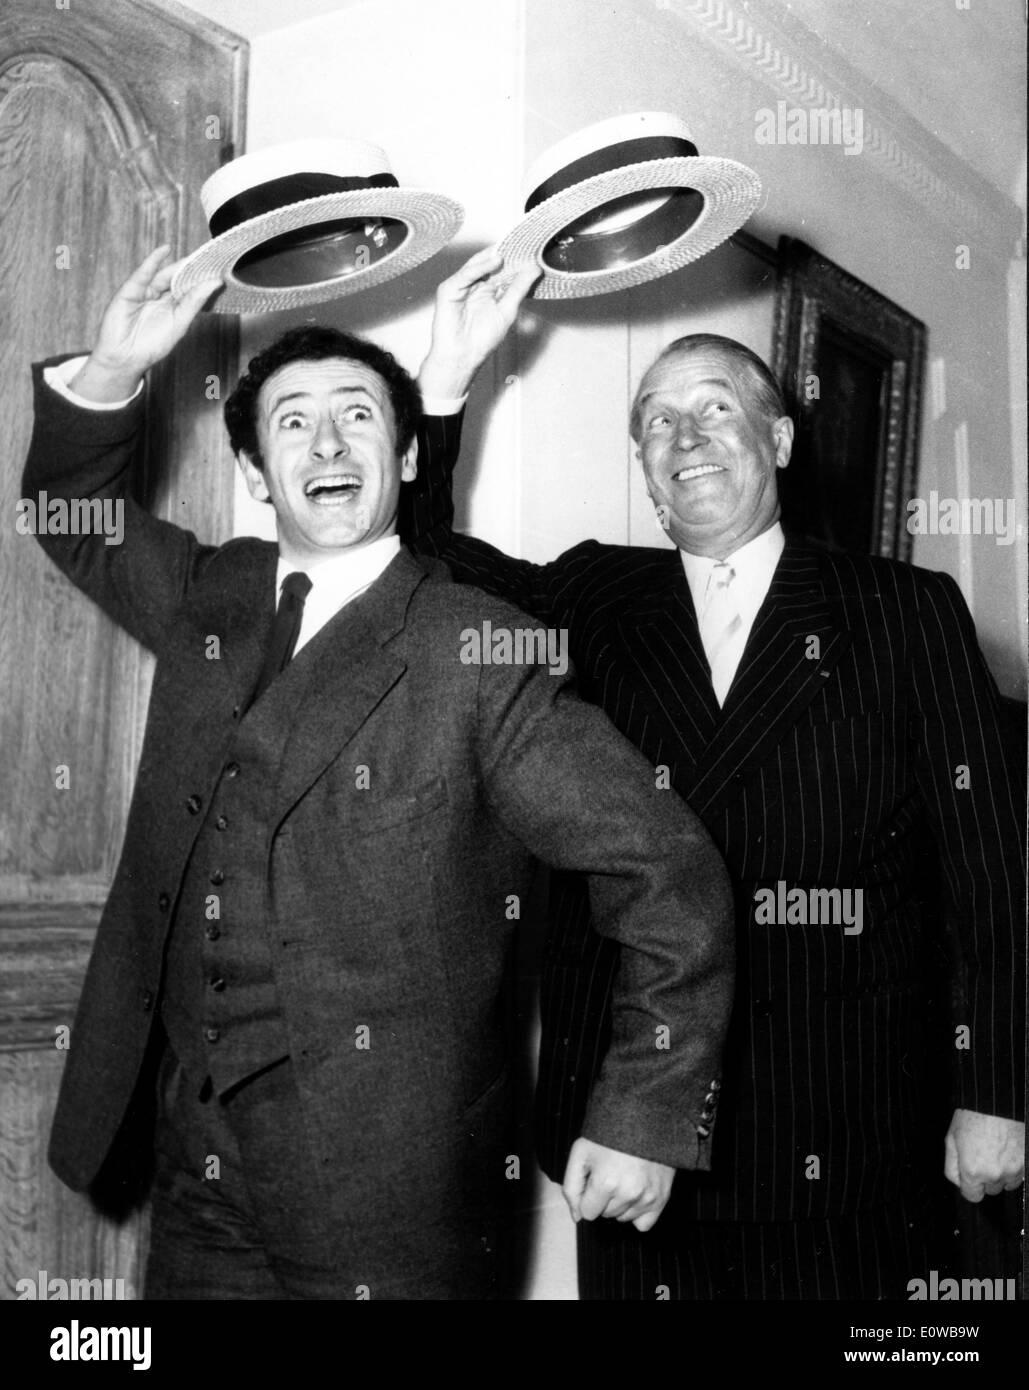 Actors Maurice Chevalier and Marcel Marceau dancing - Stock Image